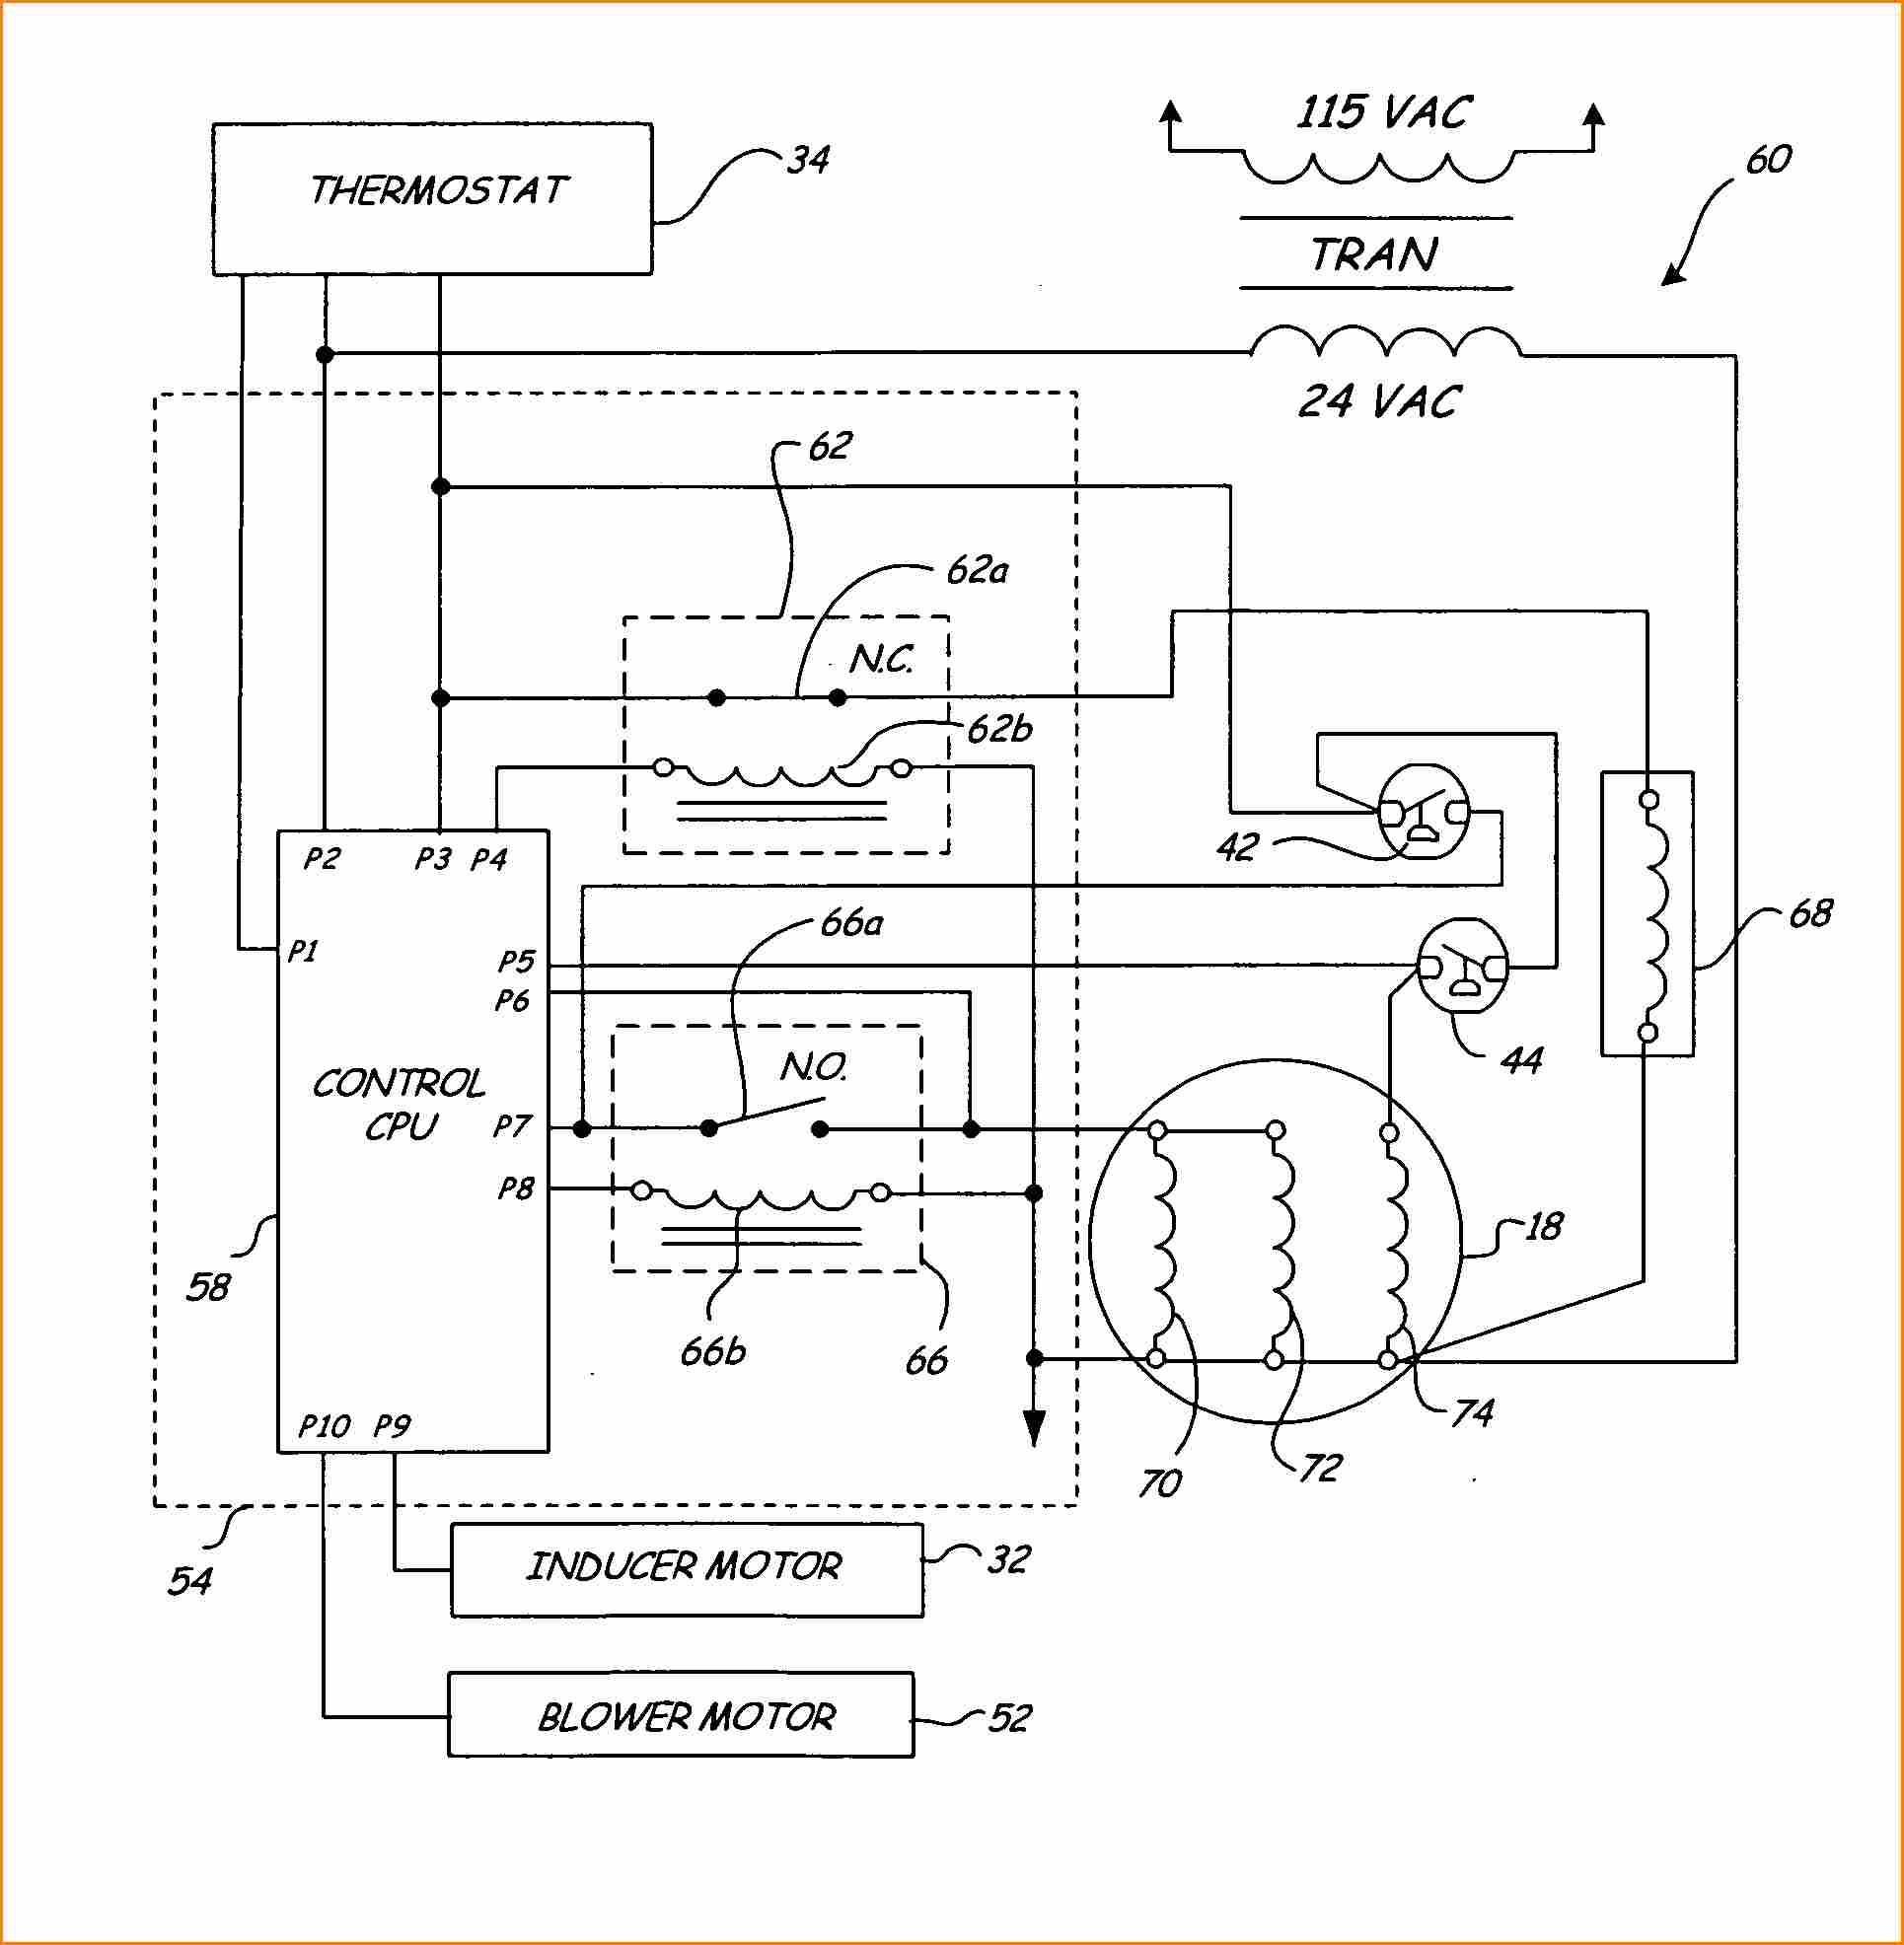 hight resolution of modine wiring diagram wiring diagram databasegas heater wiring diagram wiring diagram tutorial modine gas heater wiring